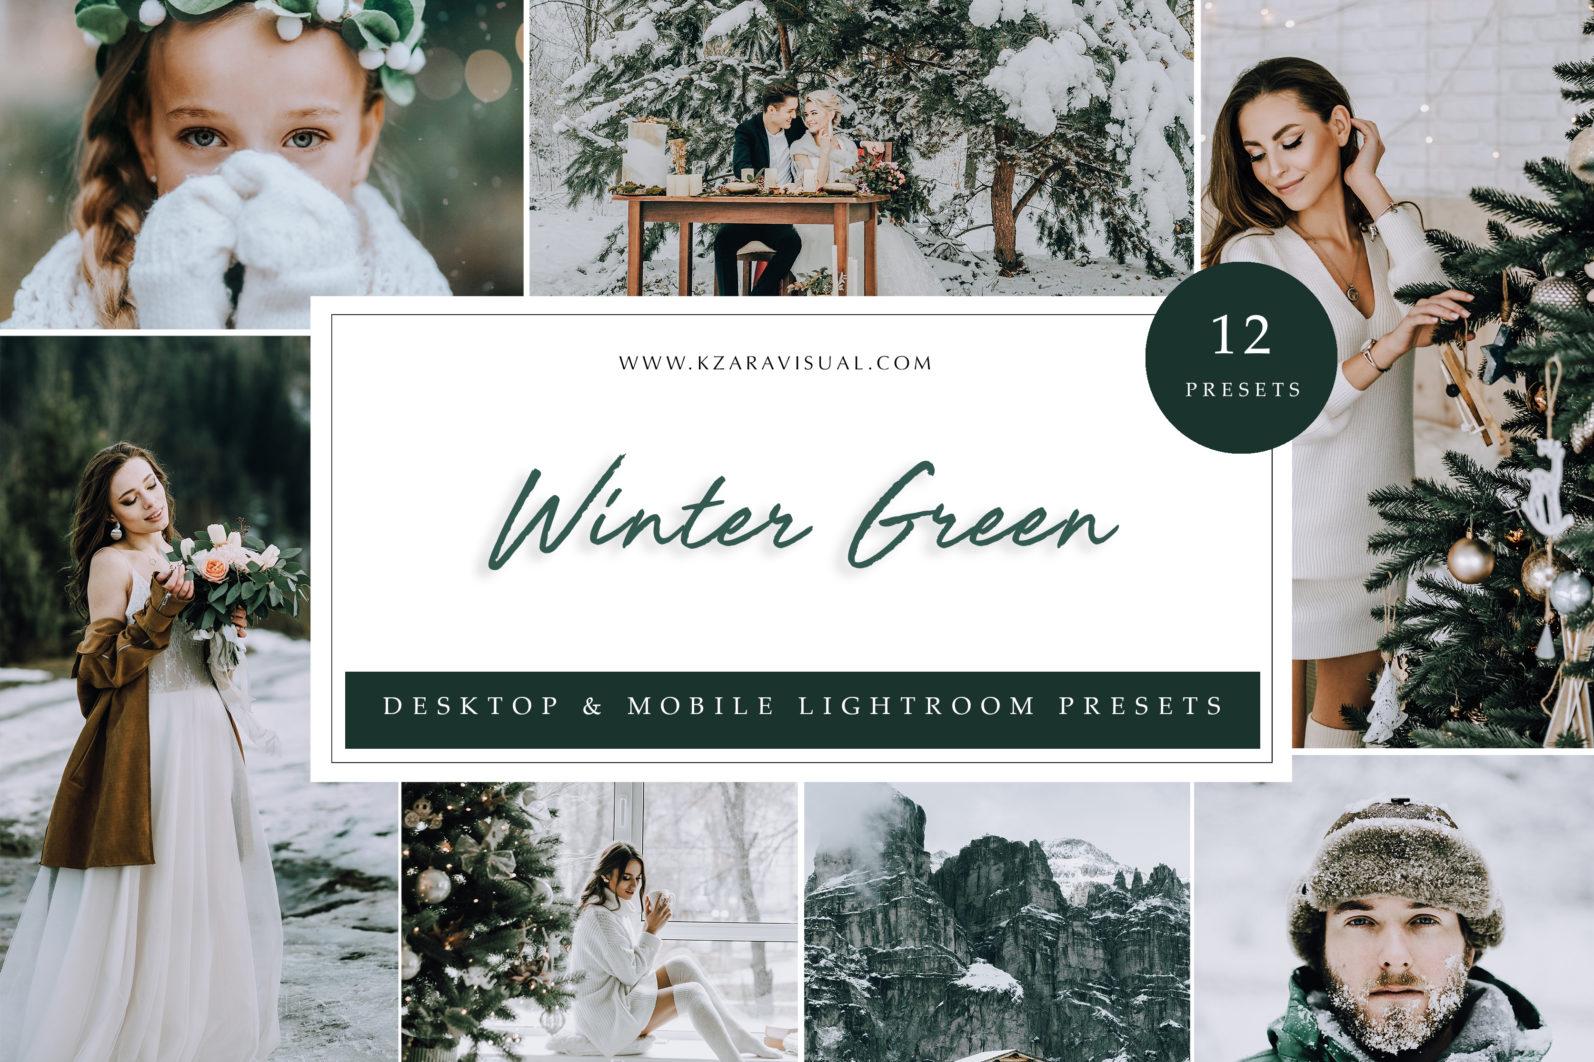 12 x Lightroom Presets, Winter Green Presets, Lanscape Presets, Green Tones Presets - Winter Green scaled -